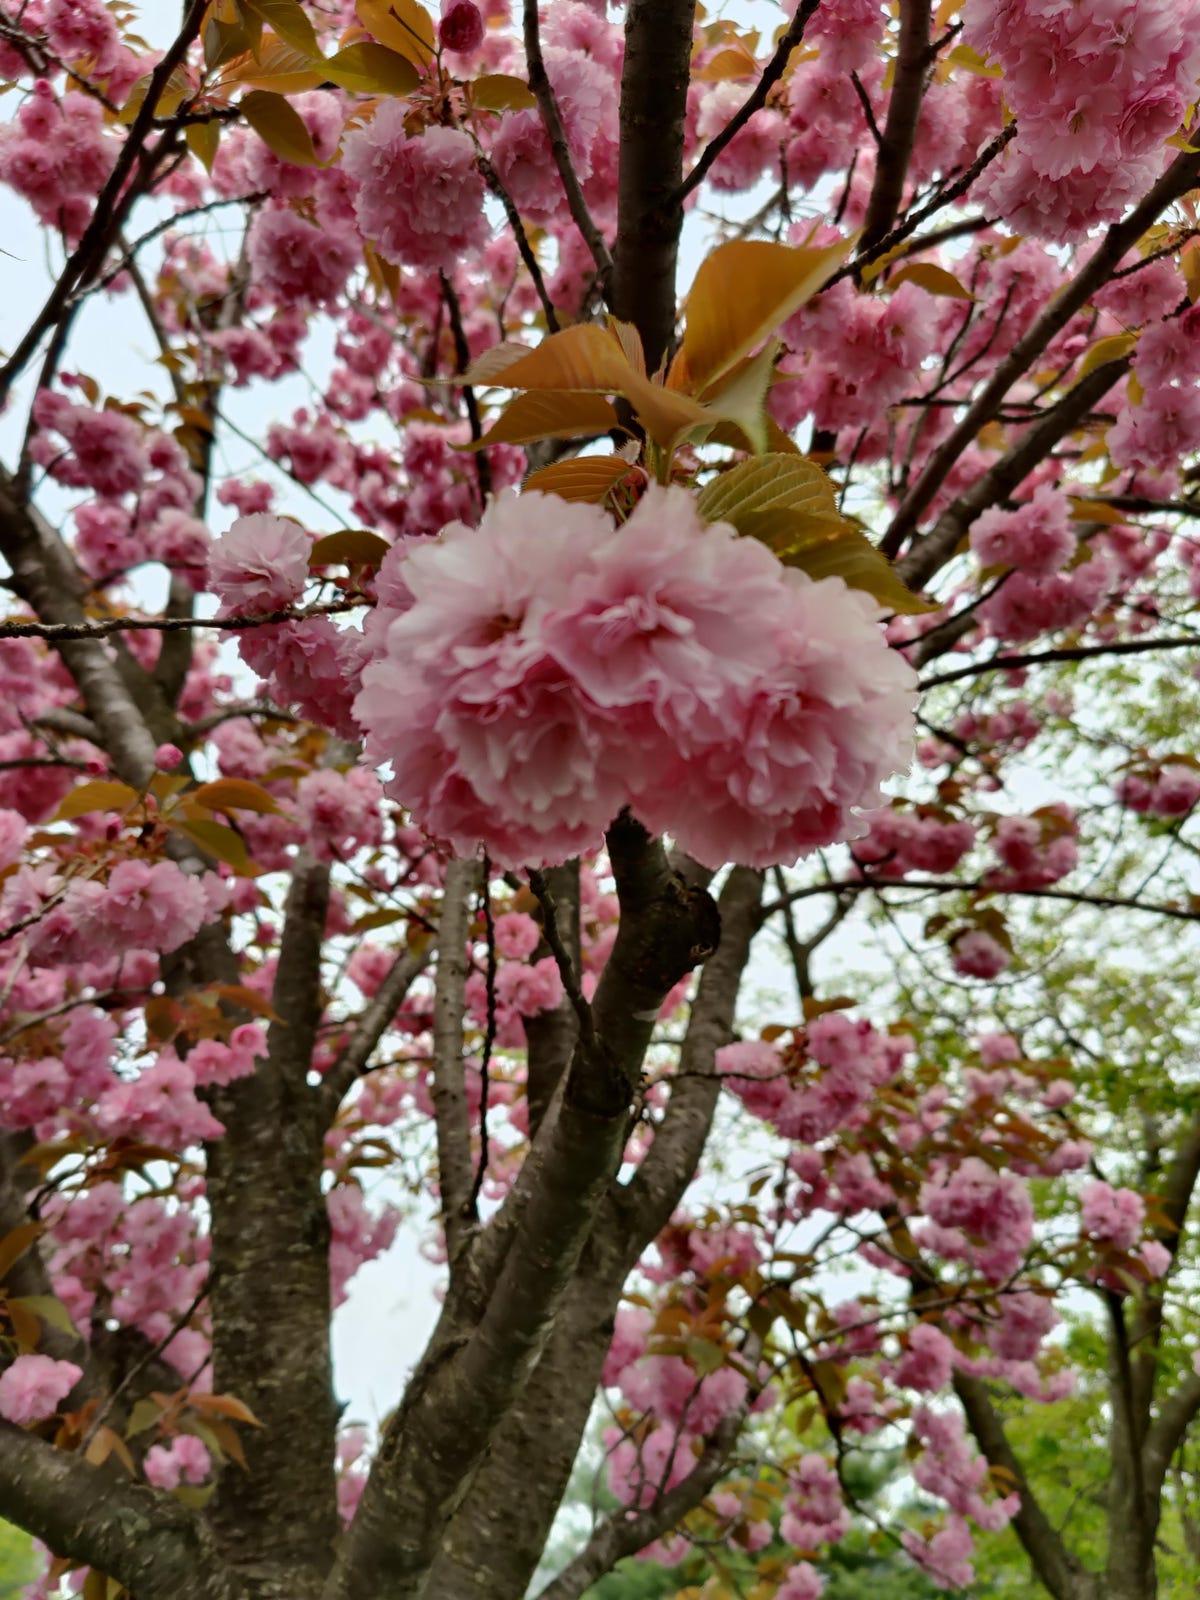 oneplus-8-pro-pink-flower.jpg